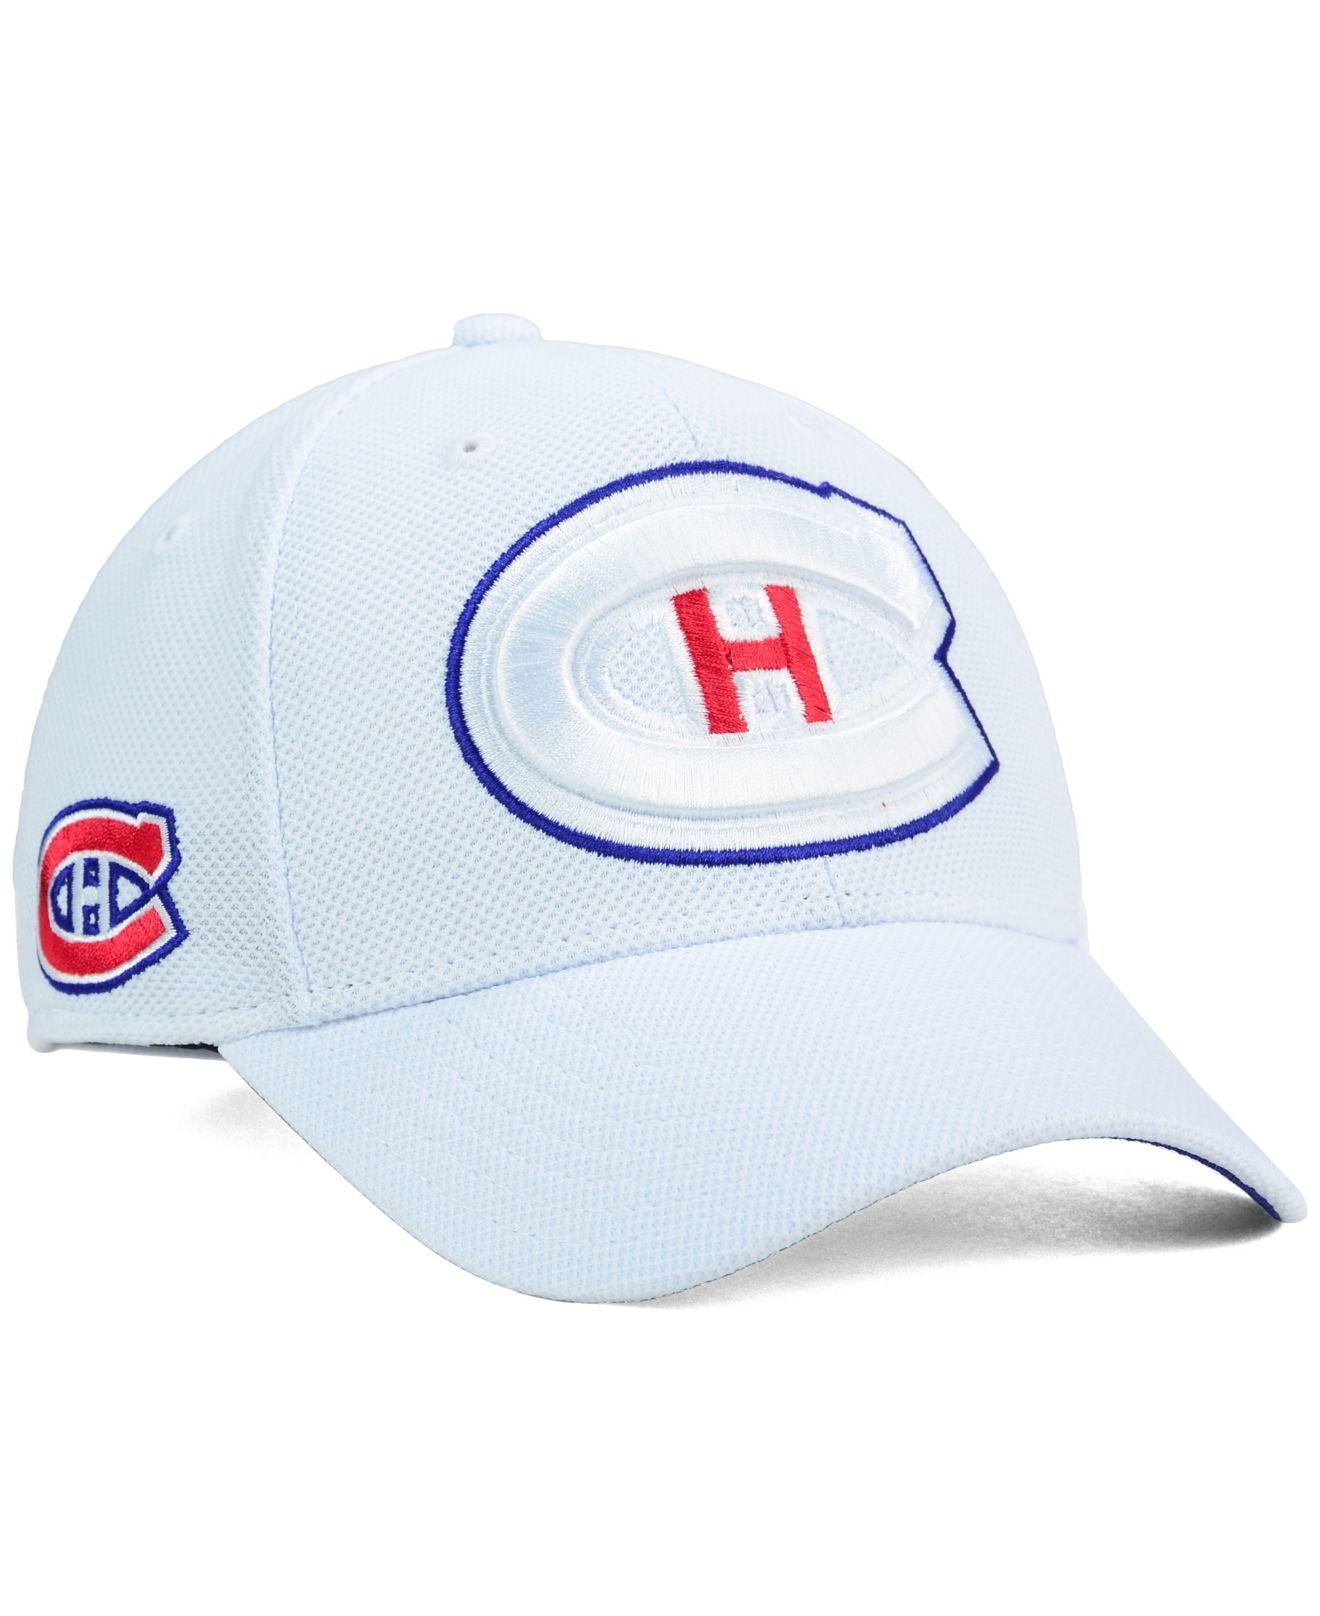 new concept 4a862 fceb6 Reebok White Montreal Canadiens 2nd Season Flex Cap for men